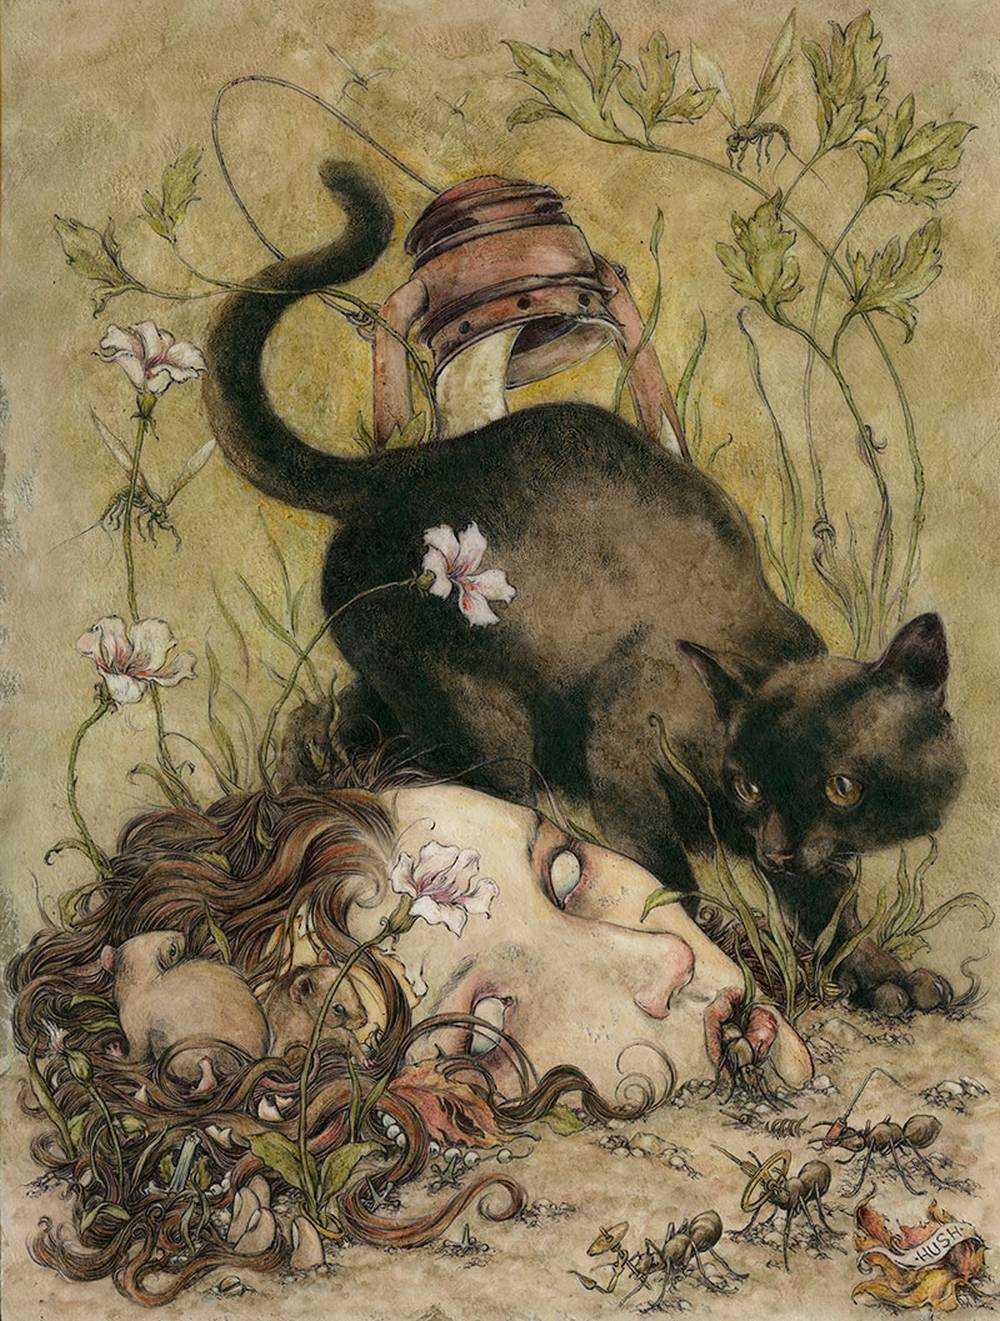 Jeremy hush - Illustrations kiu478